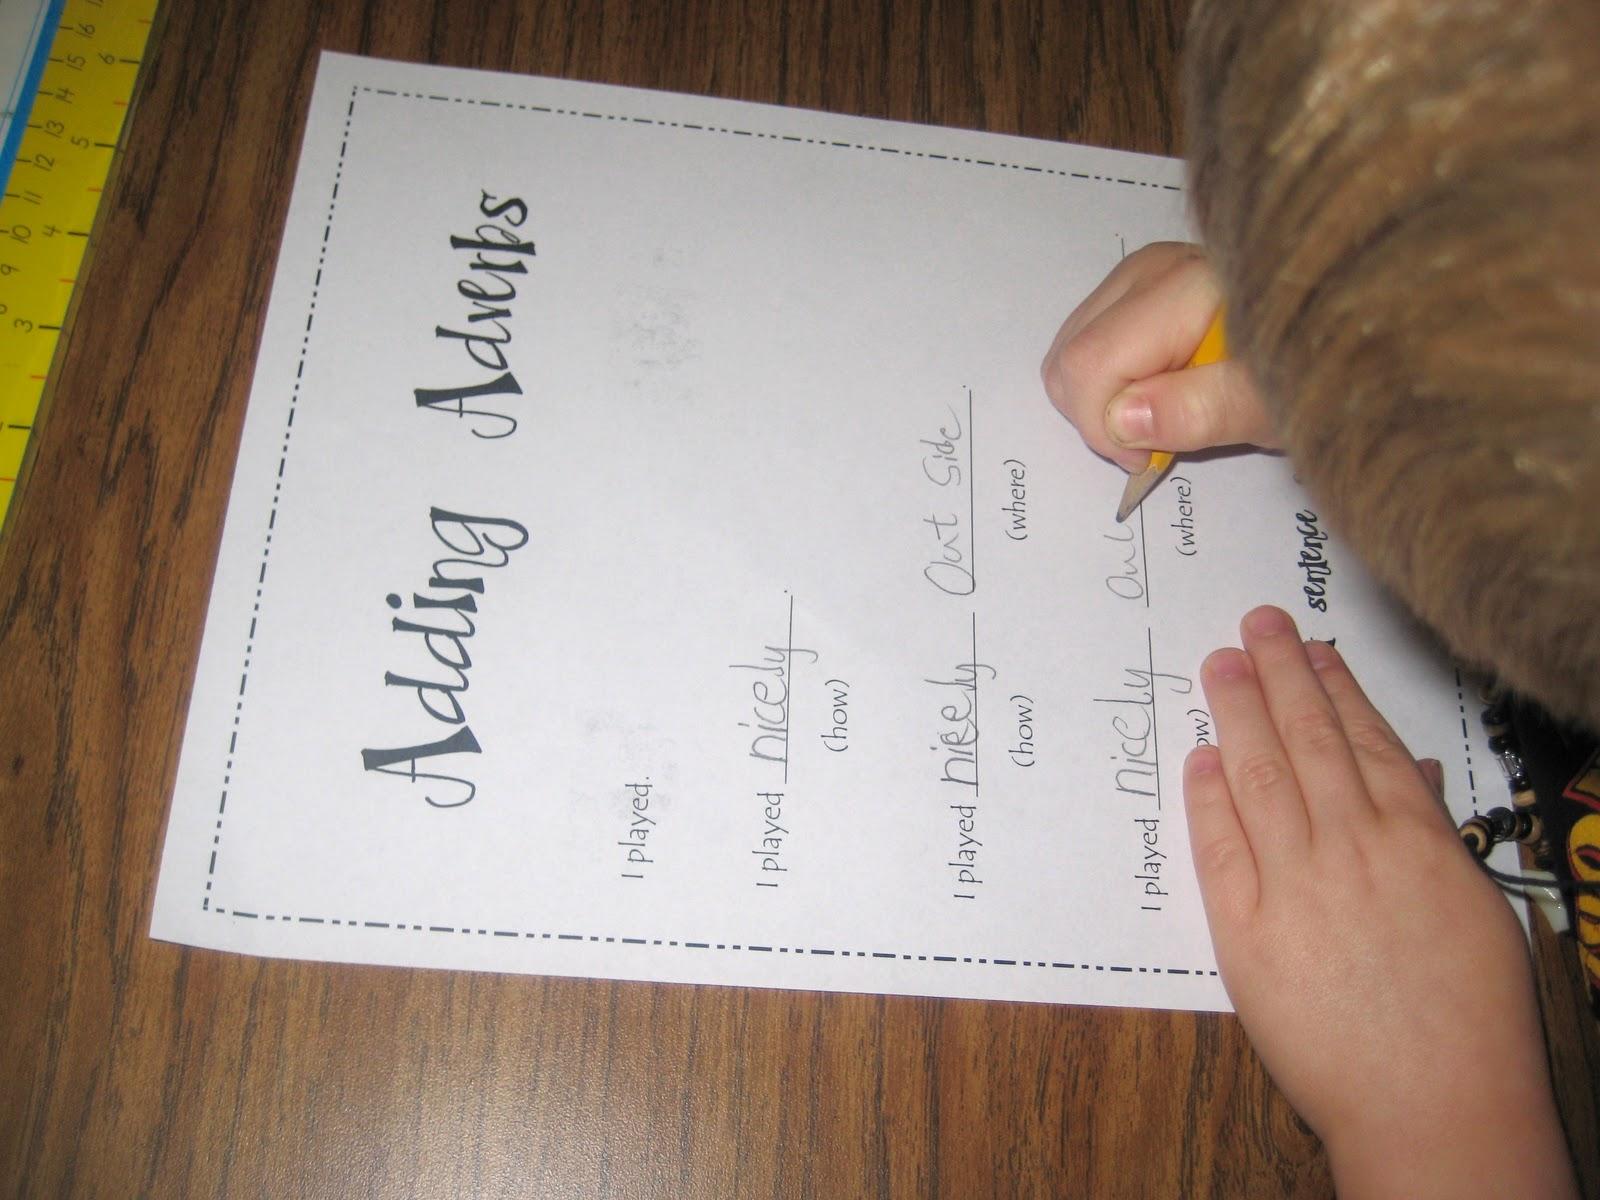 First Grade Wow Adding Adverbs